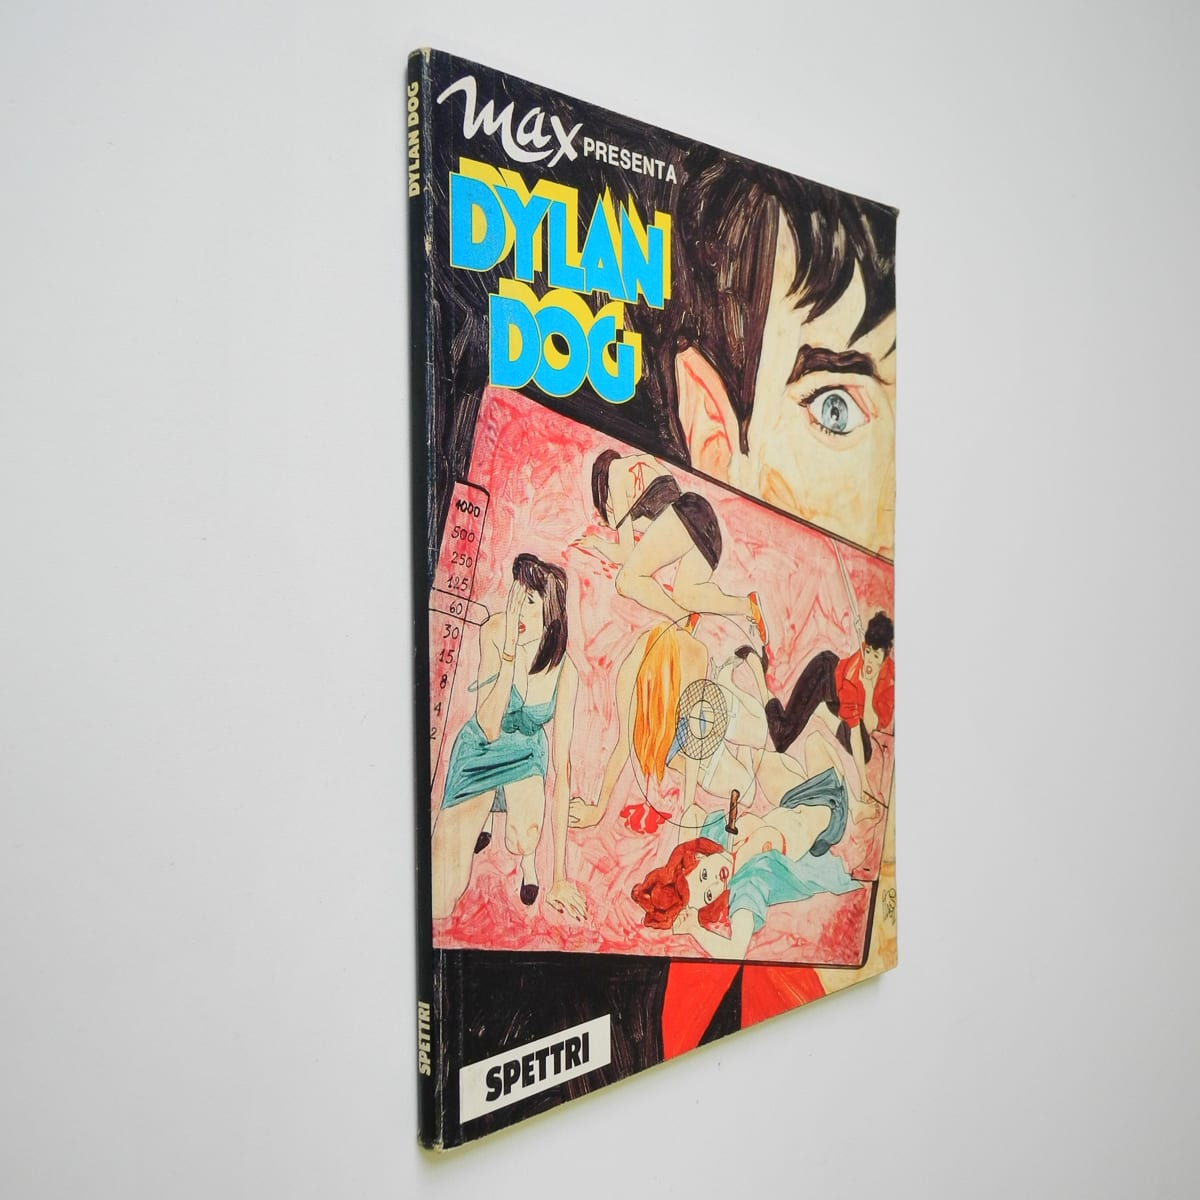 Max presenta Dylan Dog Spettri del 1993